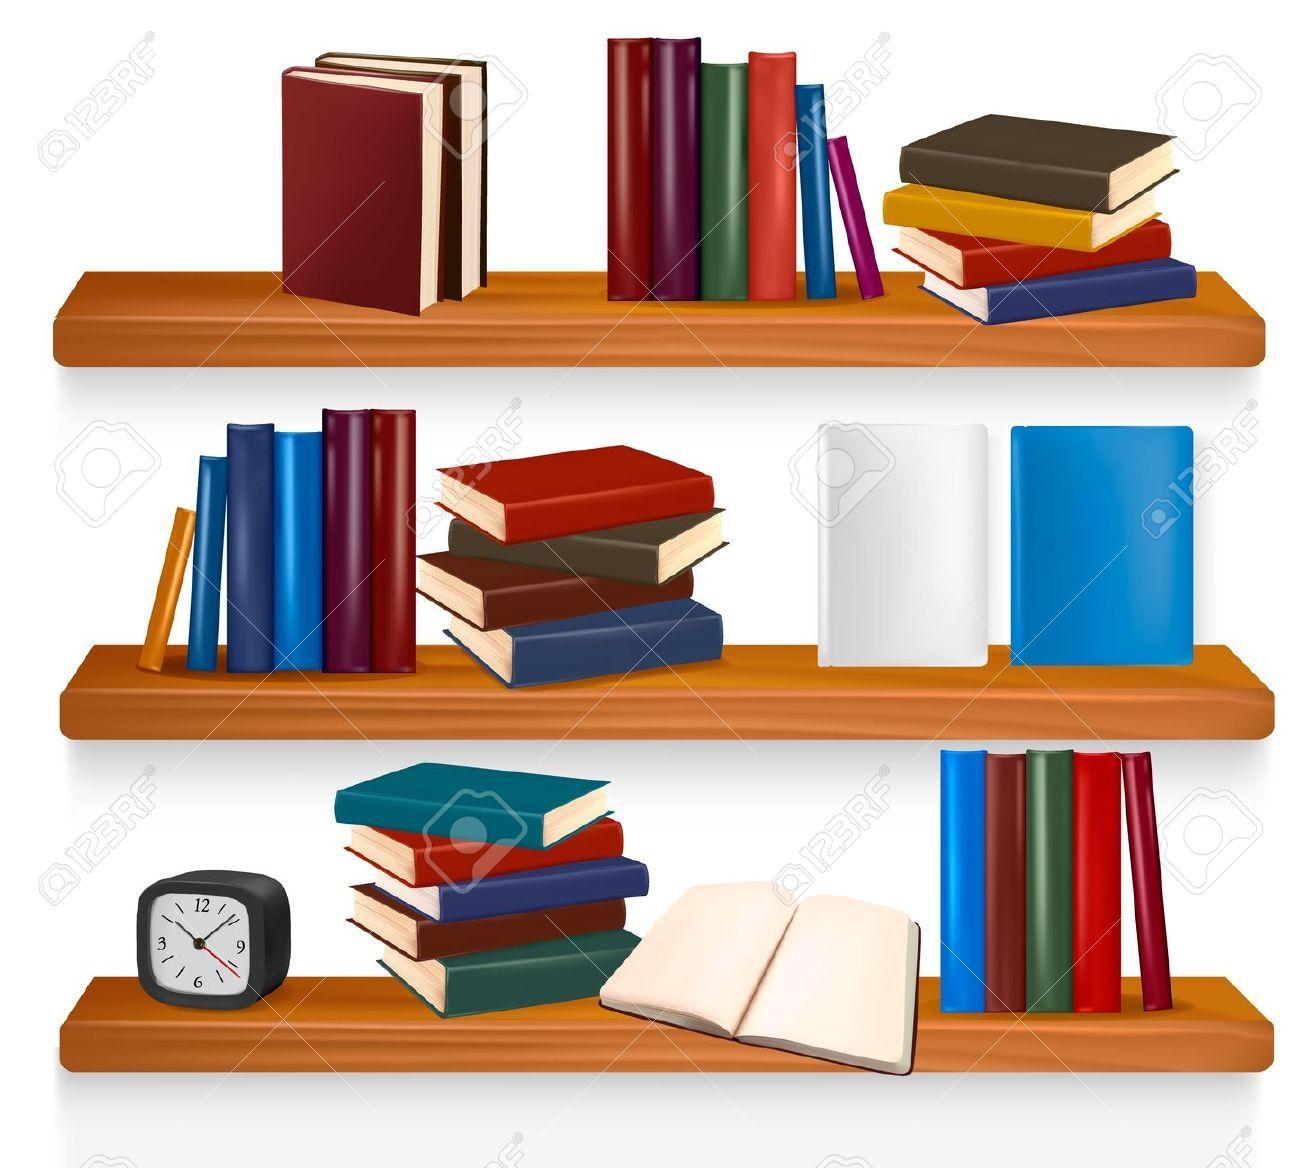 Book clipart self. Shelf clipground classroom clip